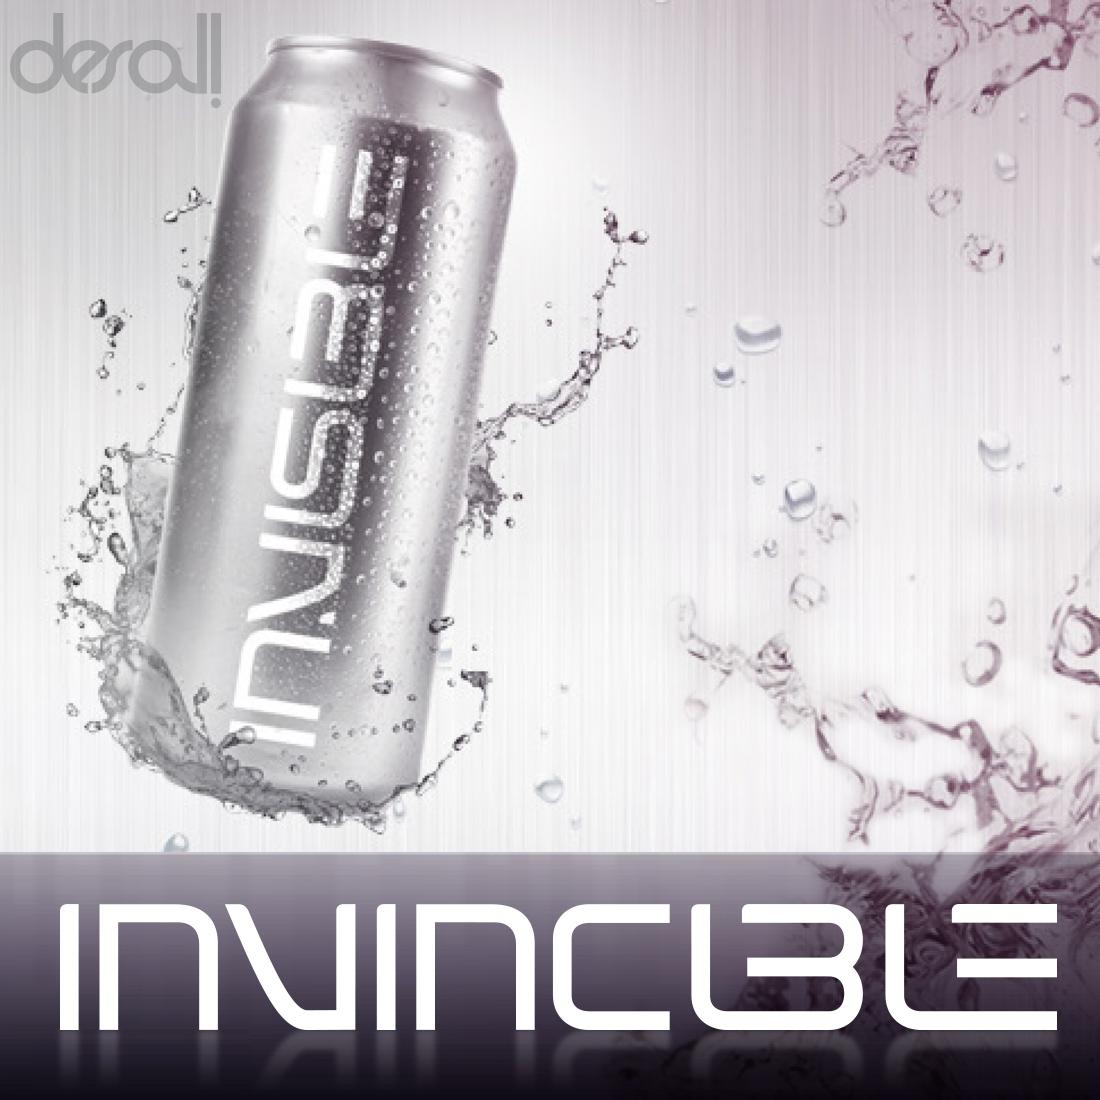 Invincible-Desall-cercabando